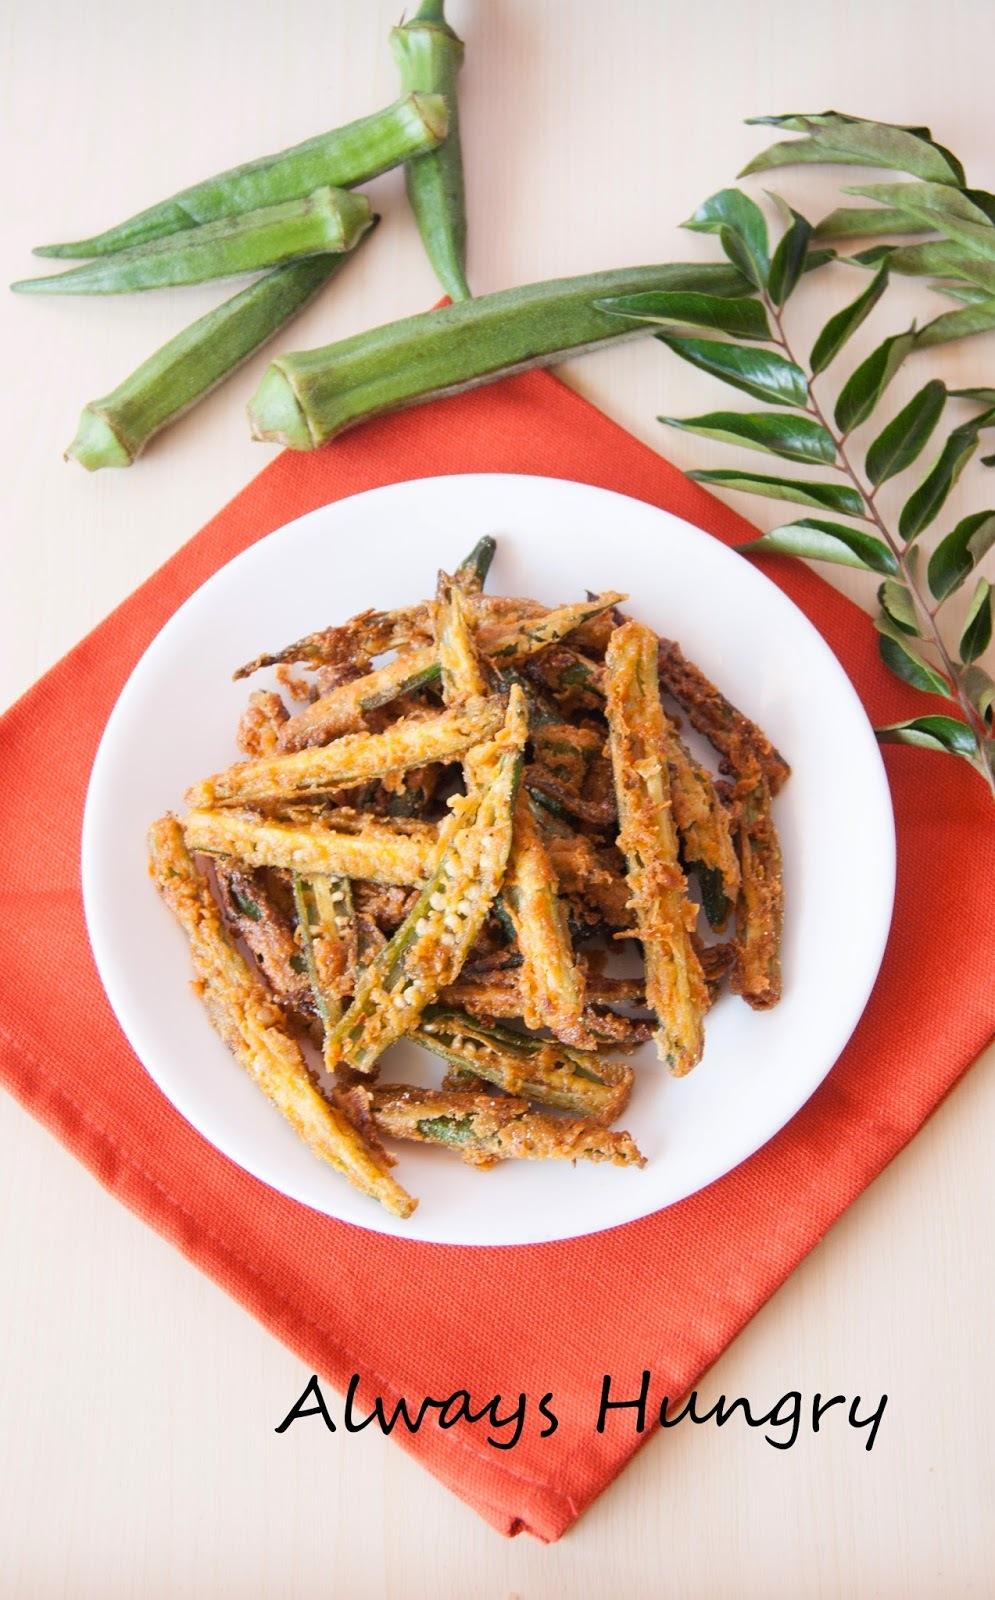 Crispy Fried Okra / Kurkuri Bhindi